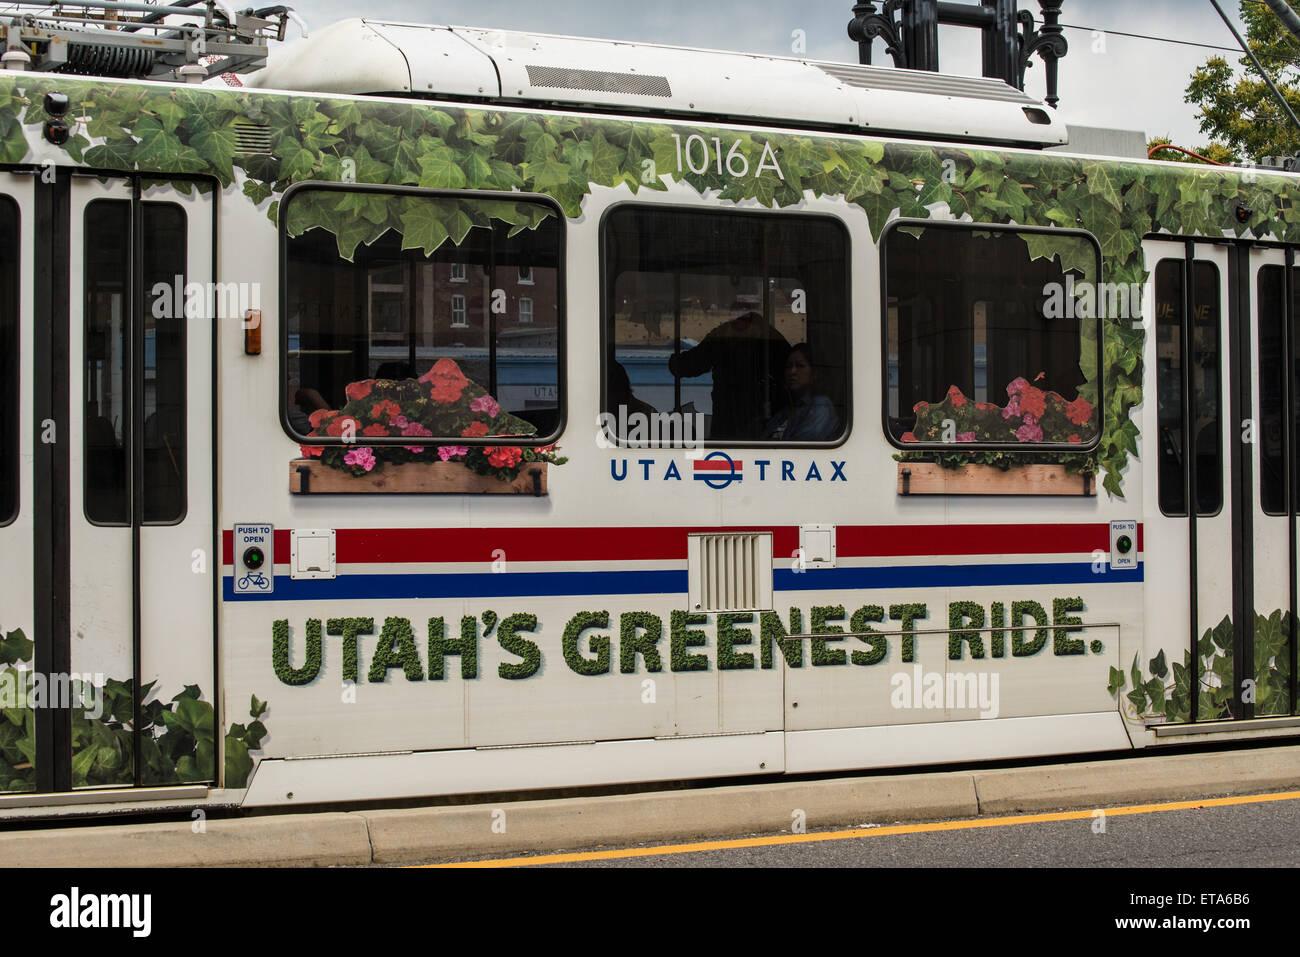 Environmentally Friendly Transportation - Utah Transit Authority (UTA) Advertisement - Salt Lake City ,Utah - Stock Image